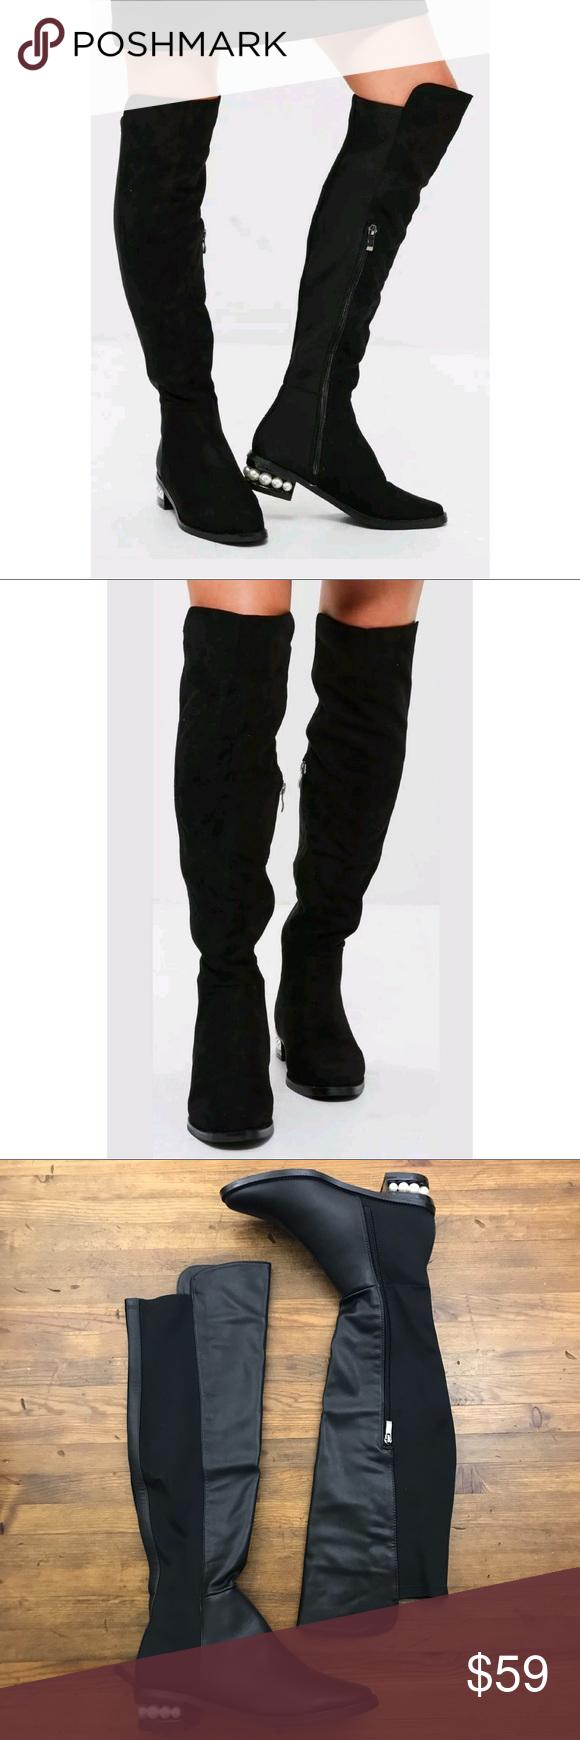 b1e6d2b2a00 Catherine Malandrino Pasta Pearl OTK Black Boots Catherine Malandrino Pasta  Pearl OTK Black Boots These amazing